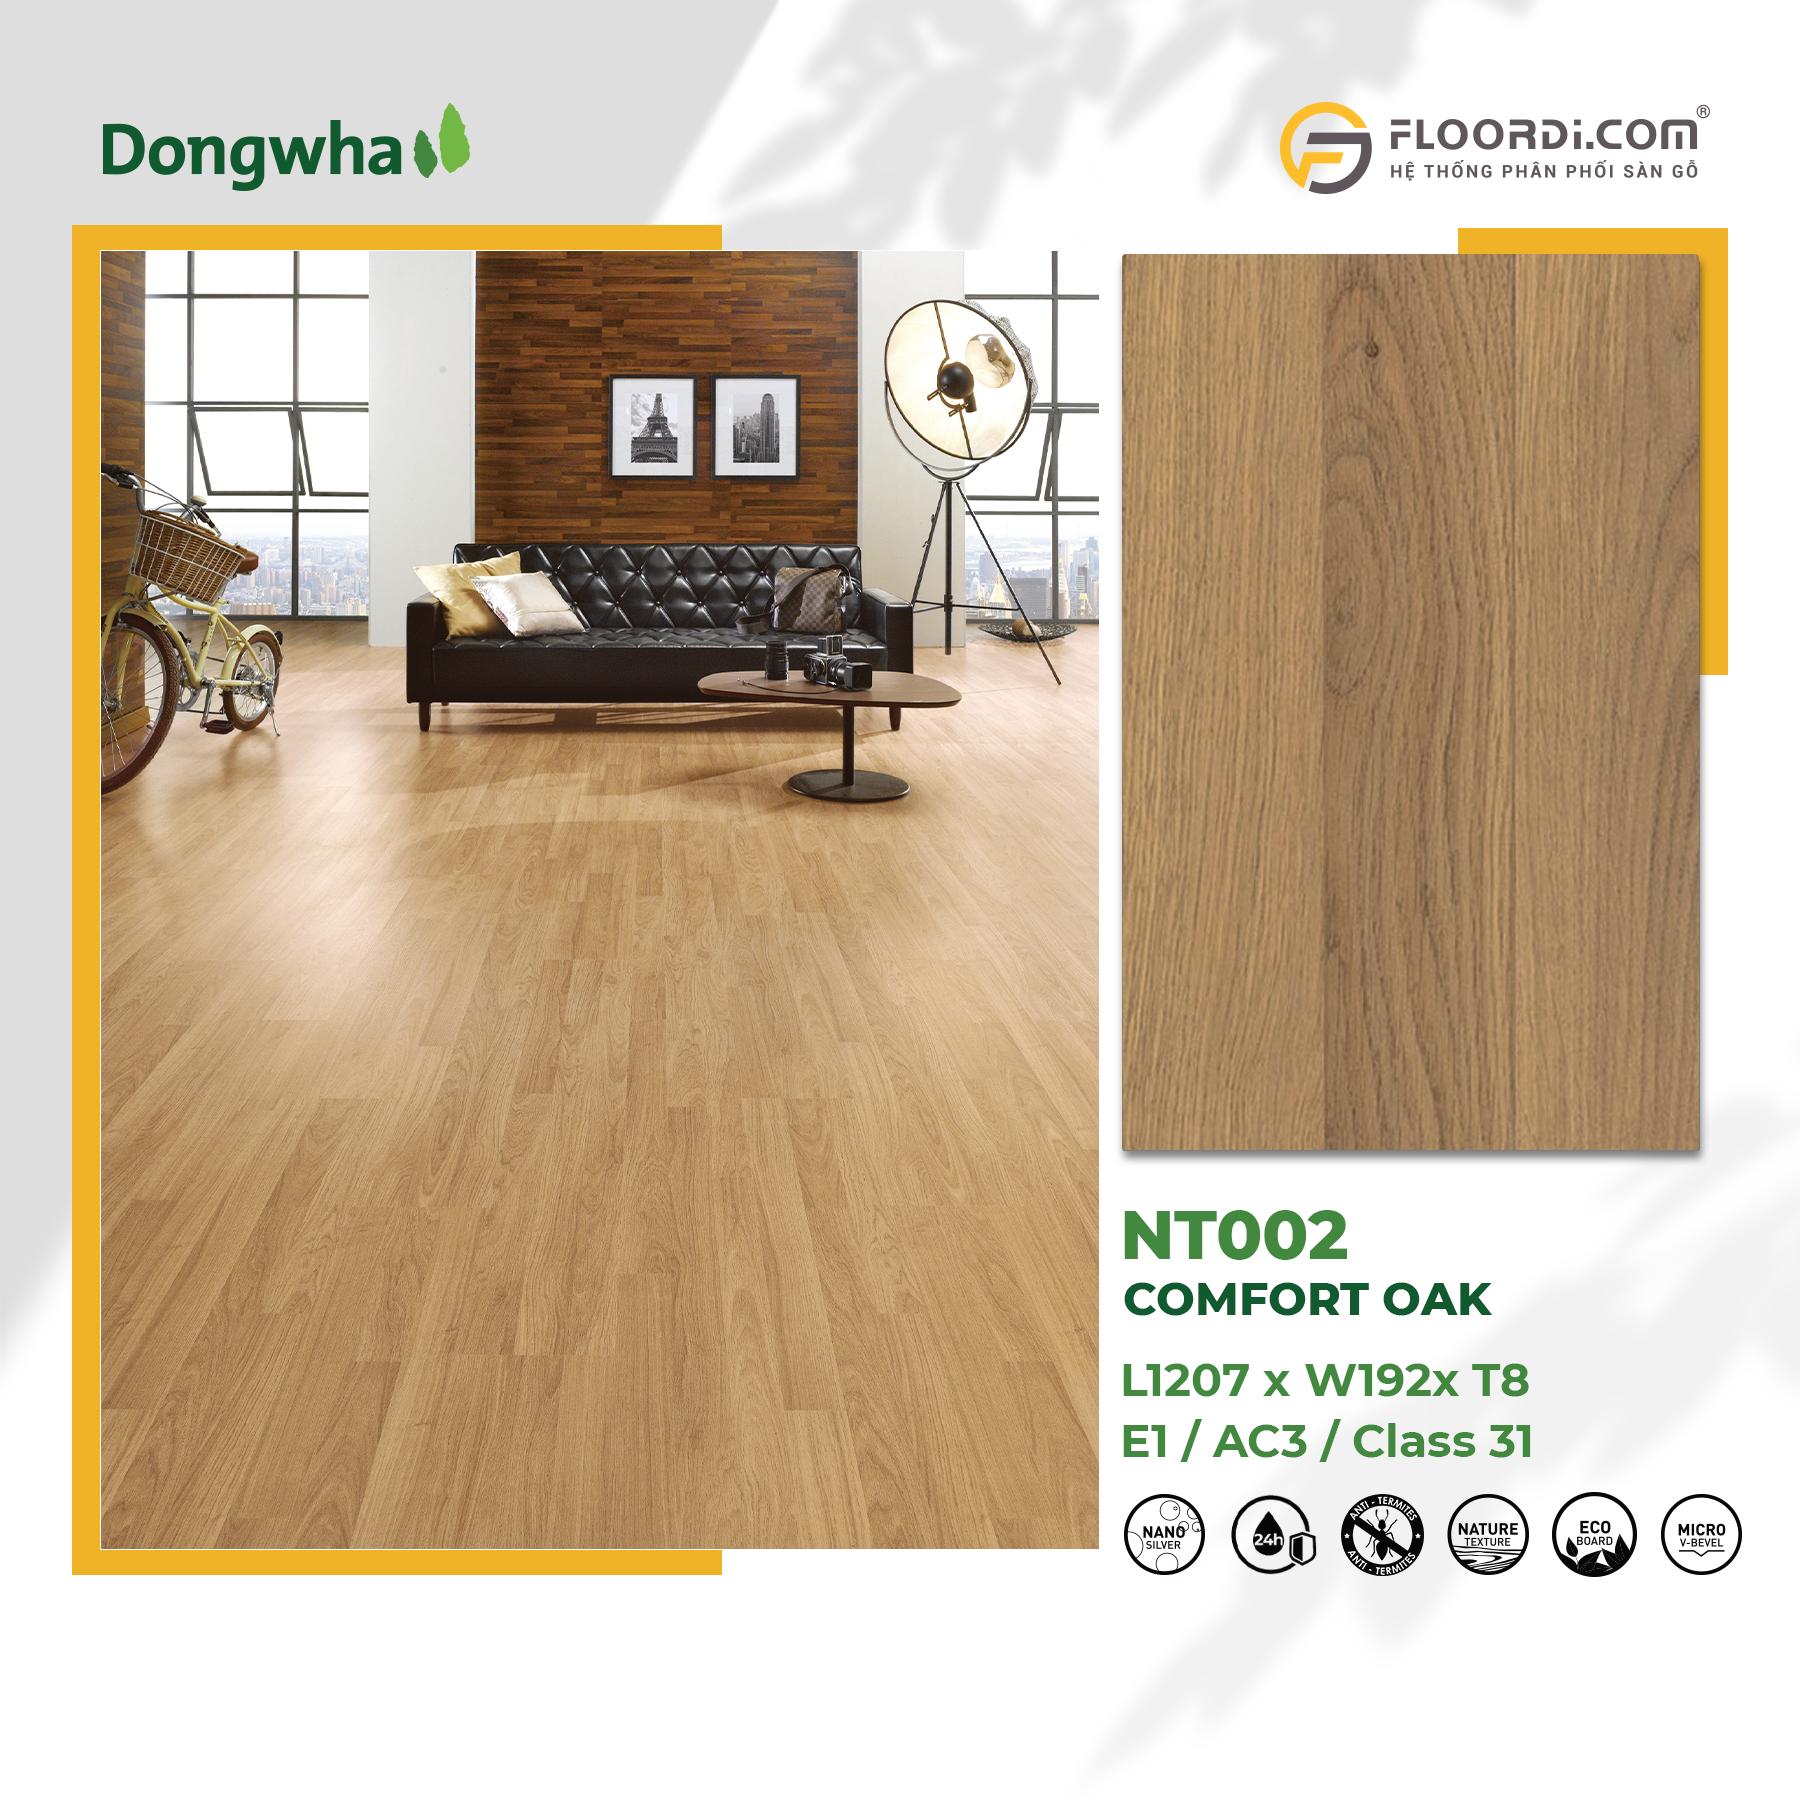 Album Dongwha 1800x1800 NT002 Comfort Oak 052021